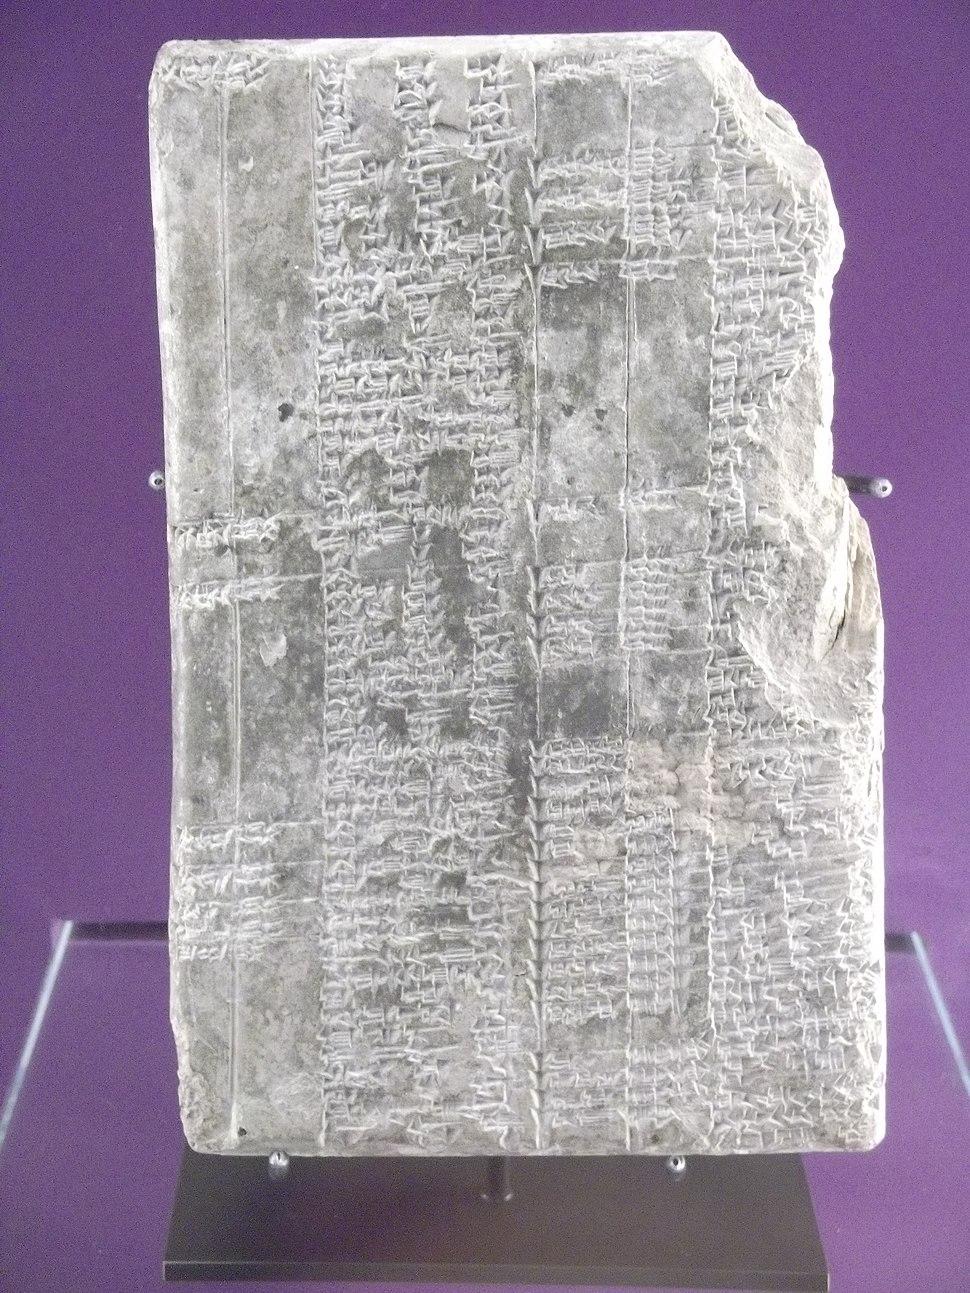 Wörterbuch Uruk